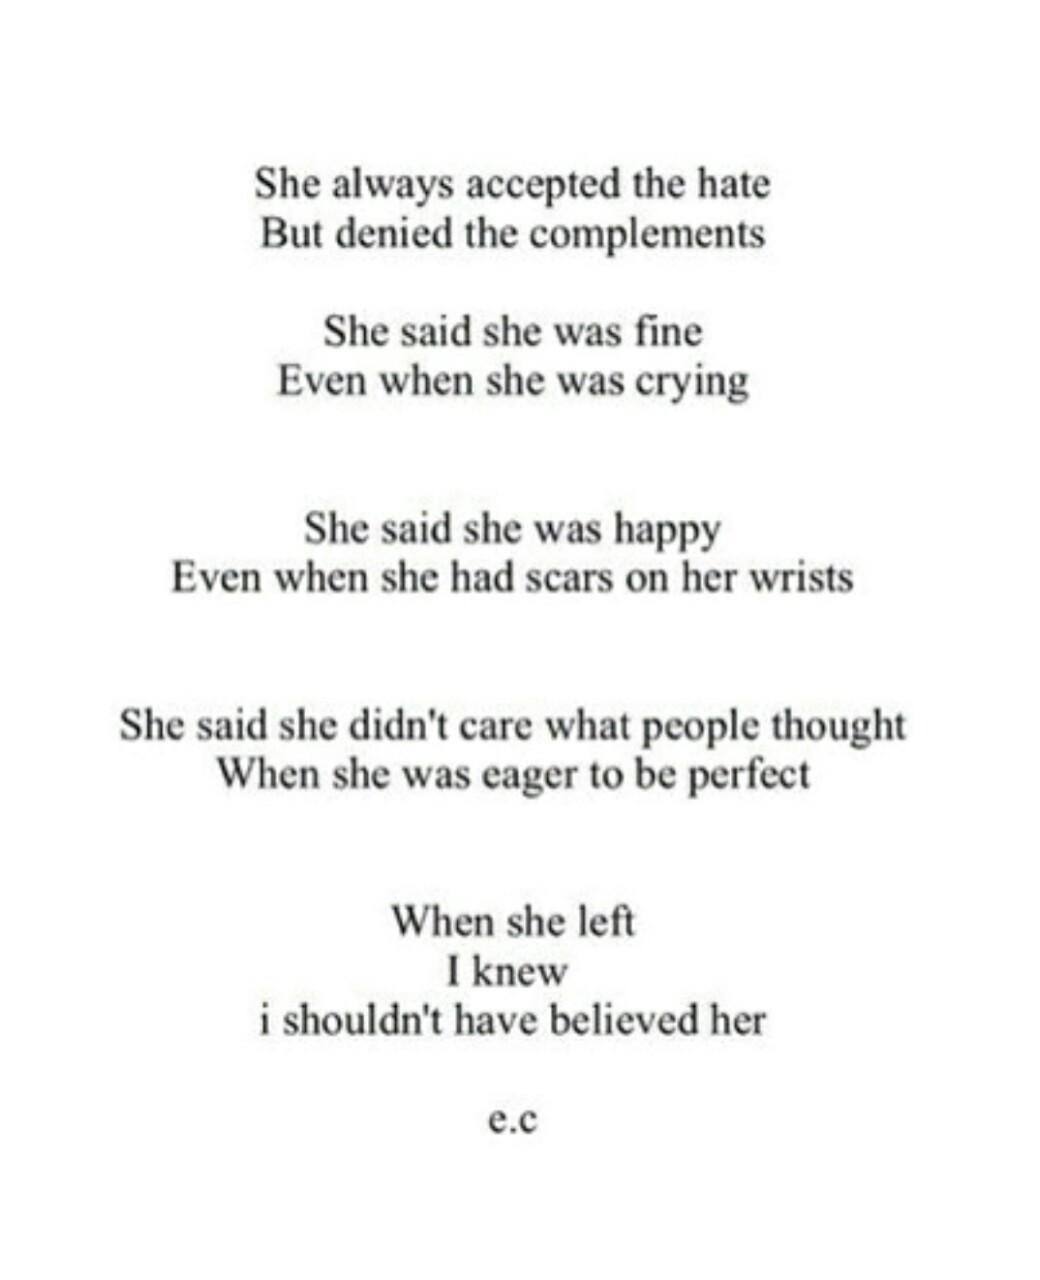 Funny Suicidal Quotes : funny, suicidal, quotes, Inside, Myself